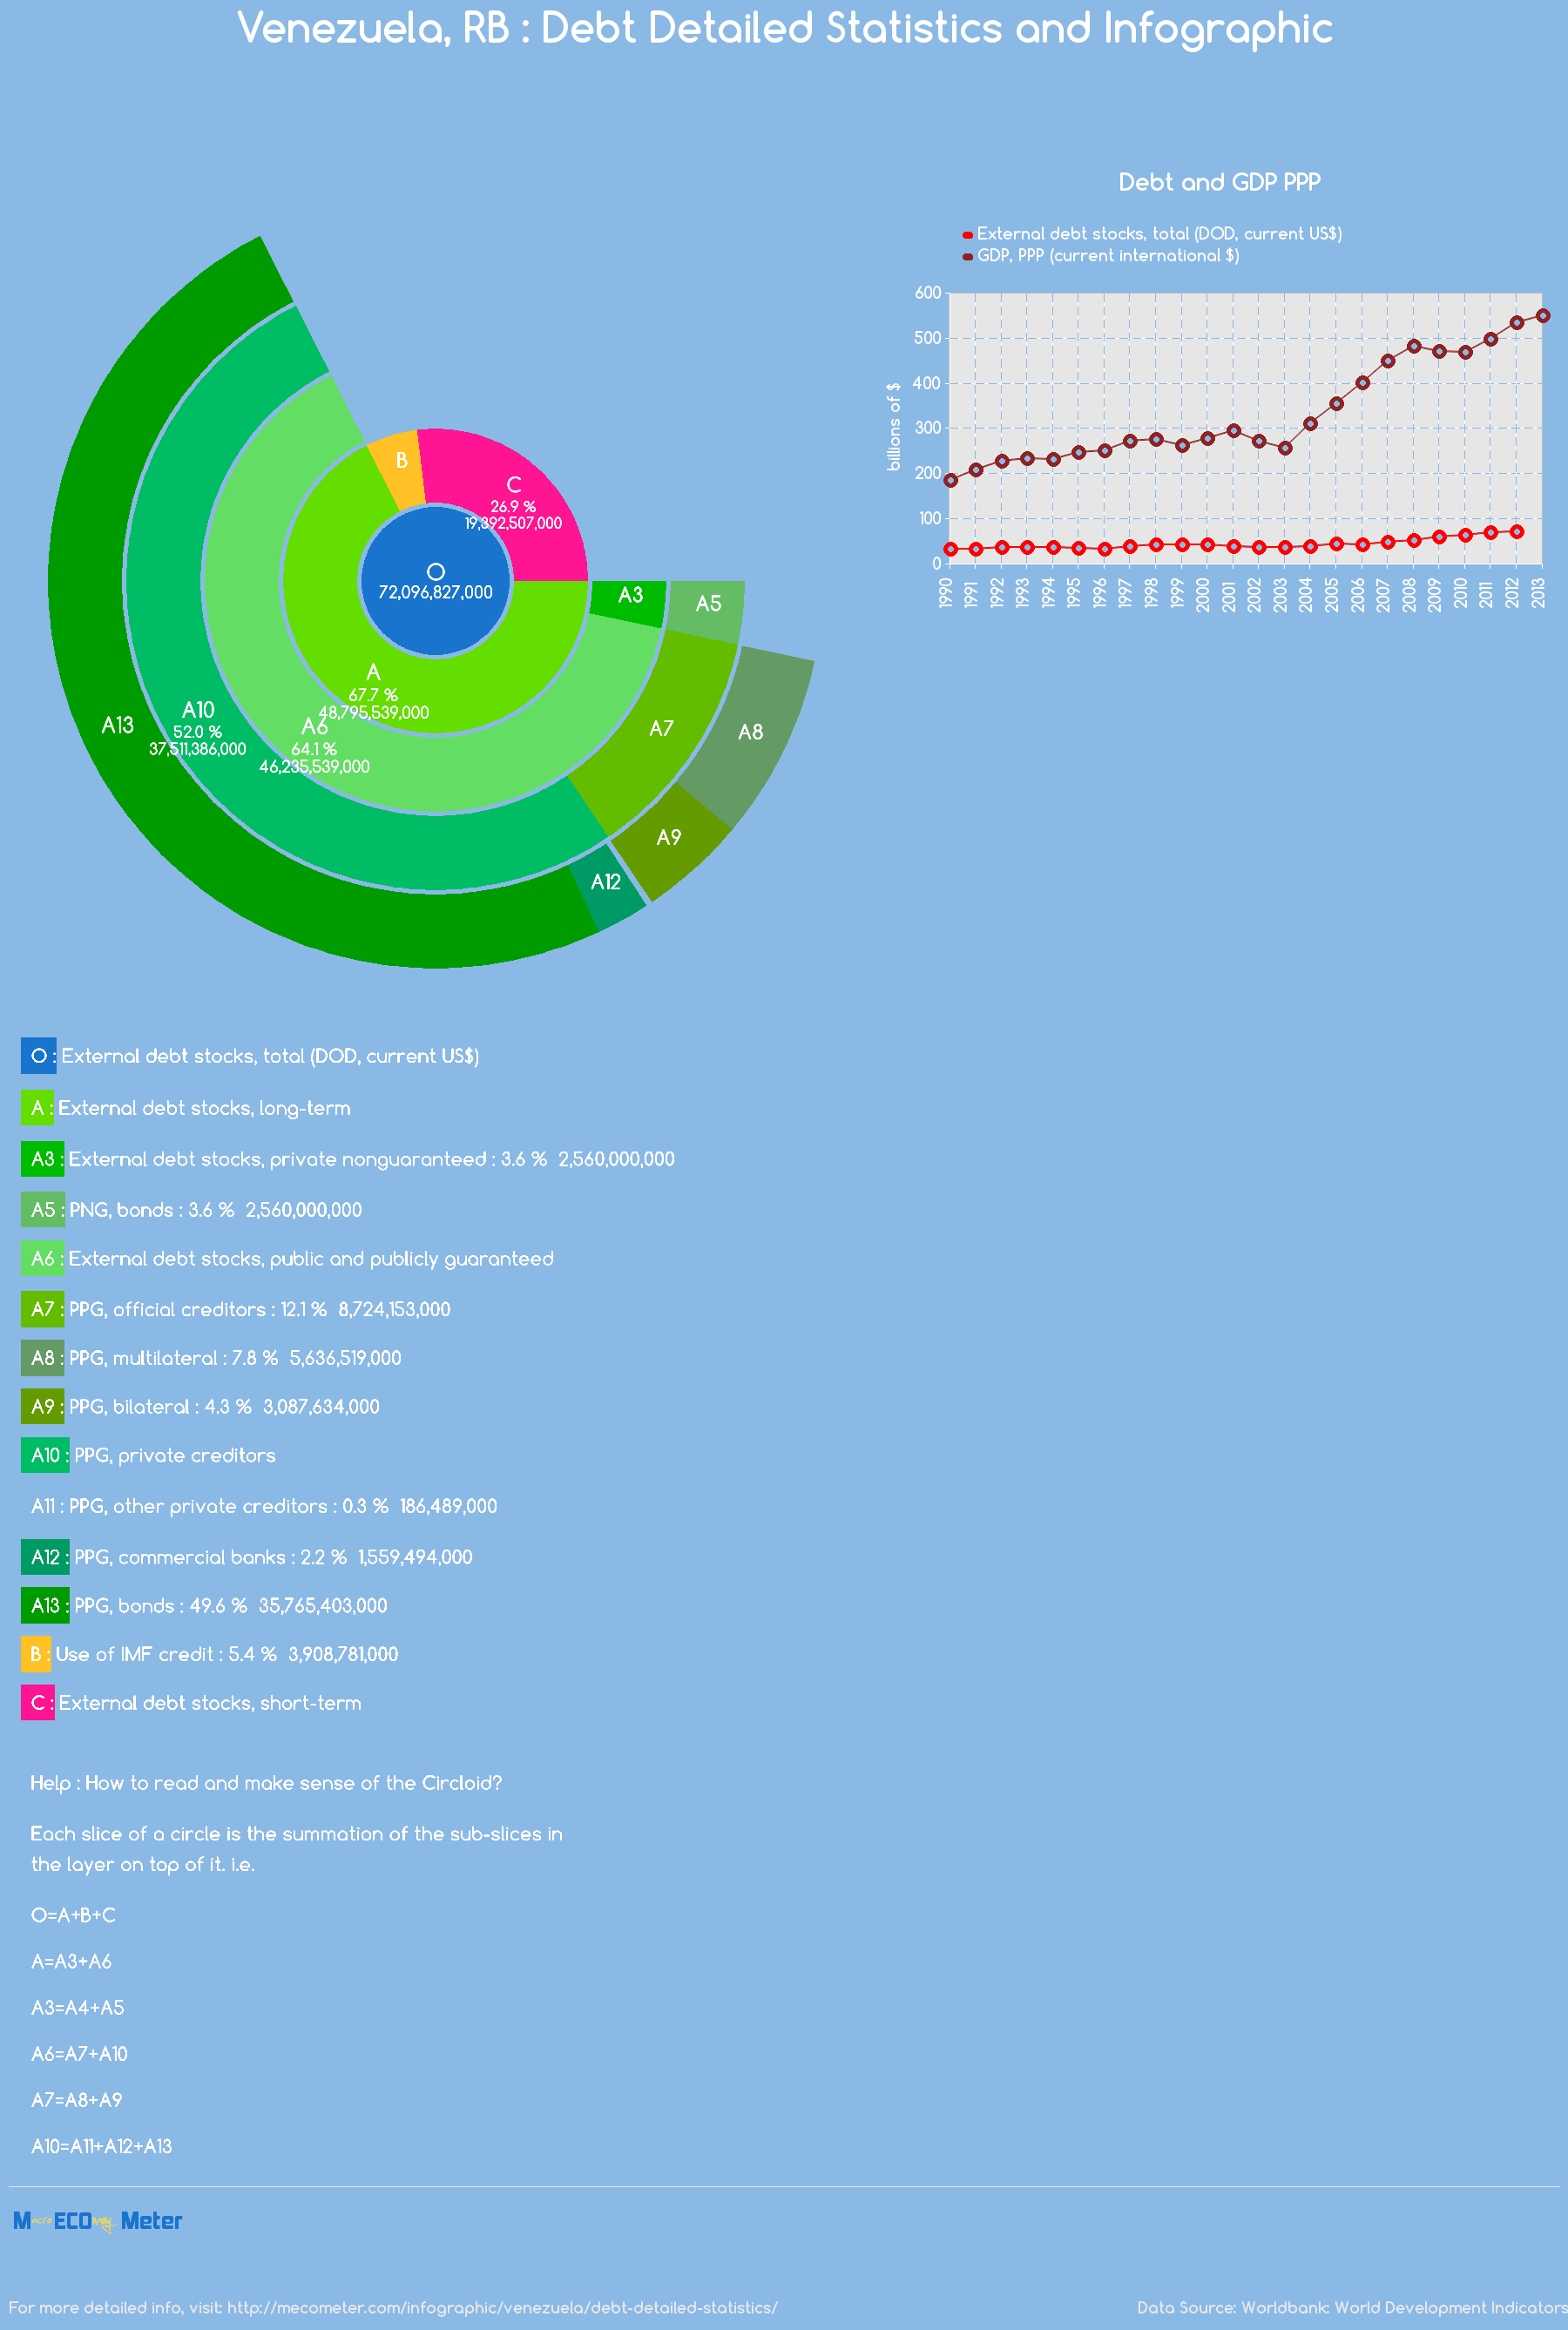 Venezuela, RB : Debt Detailed Statistics and Infographic